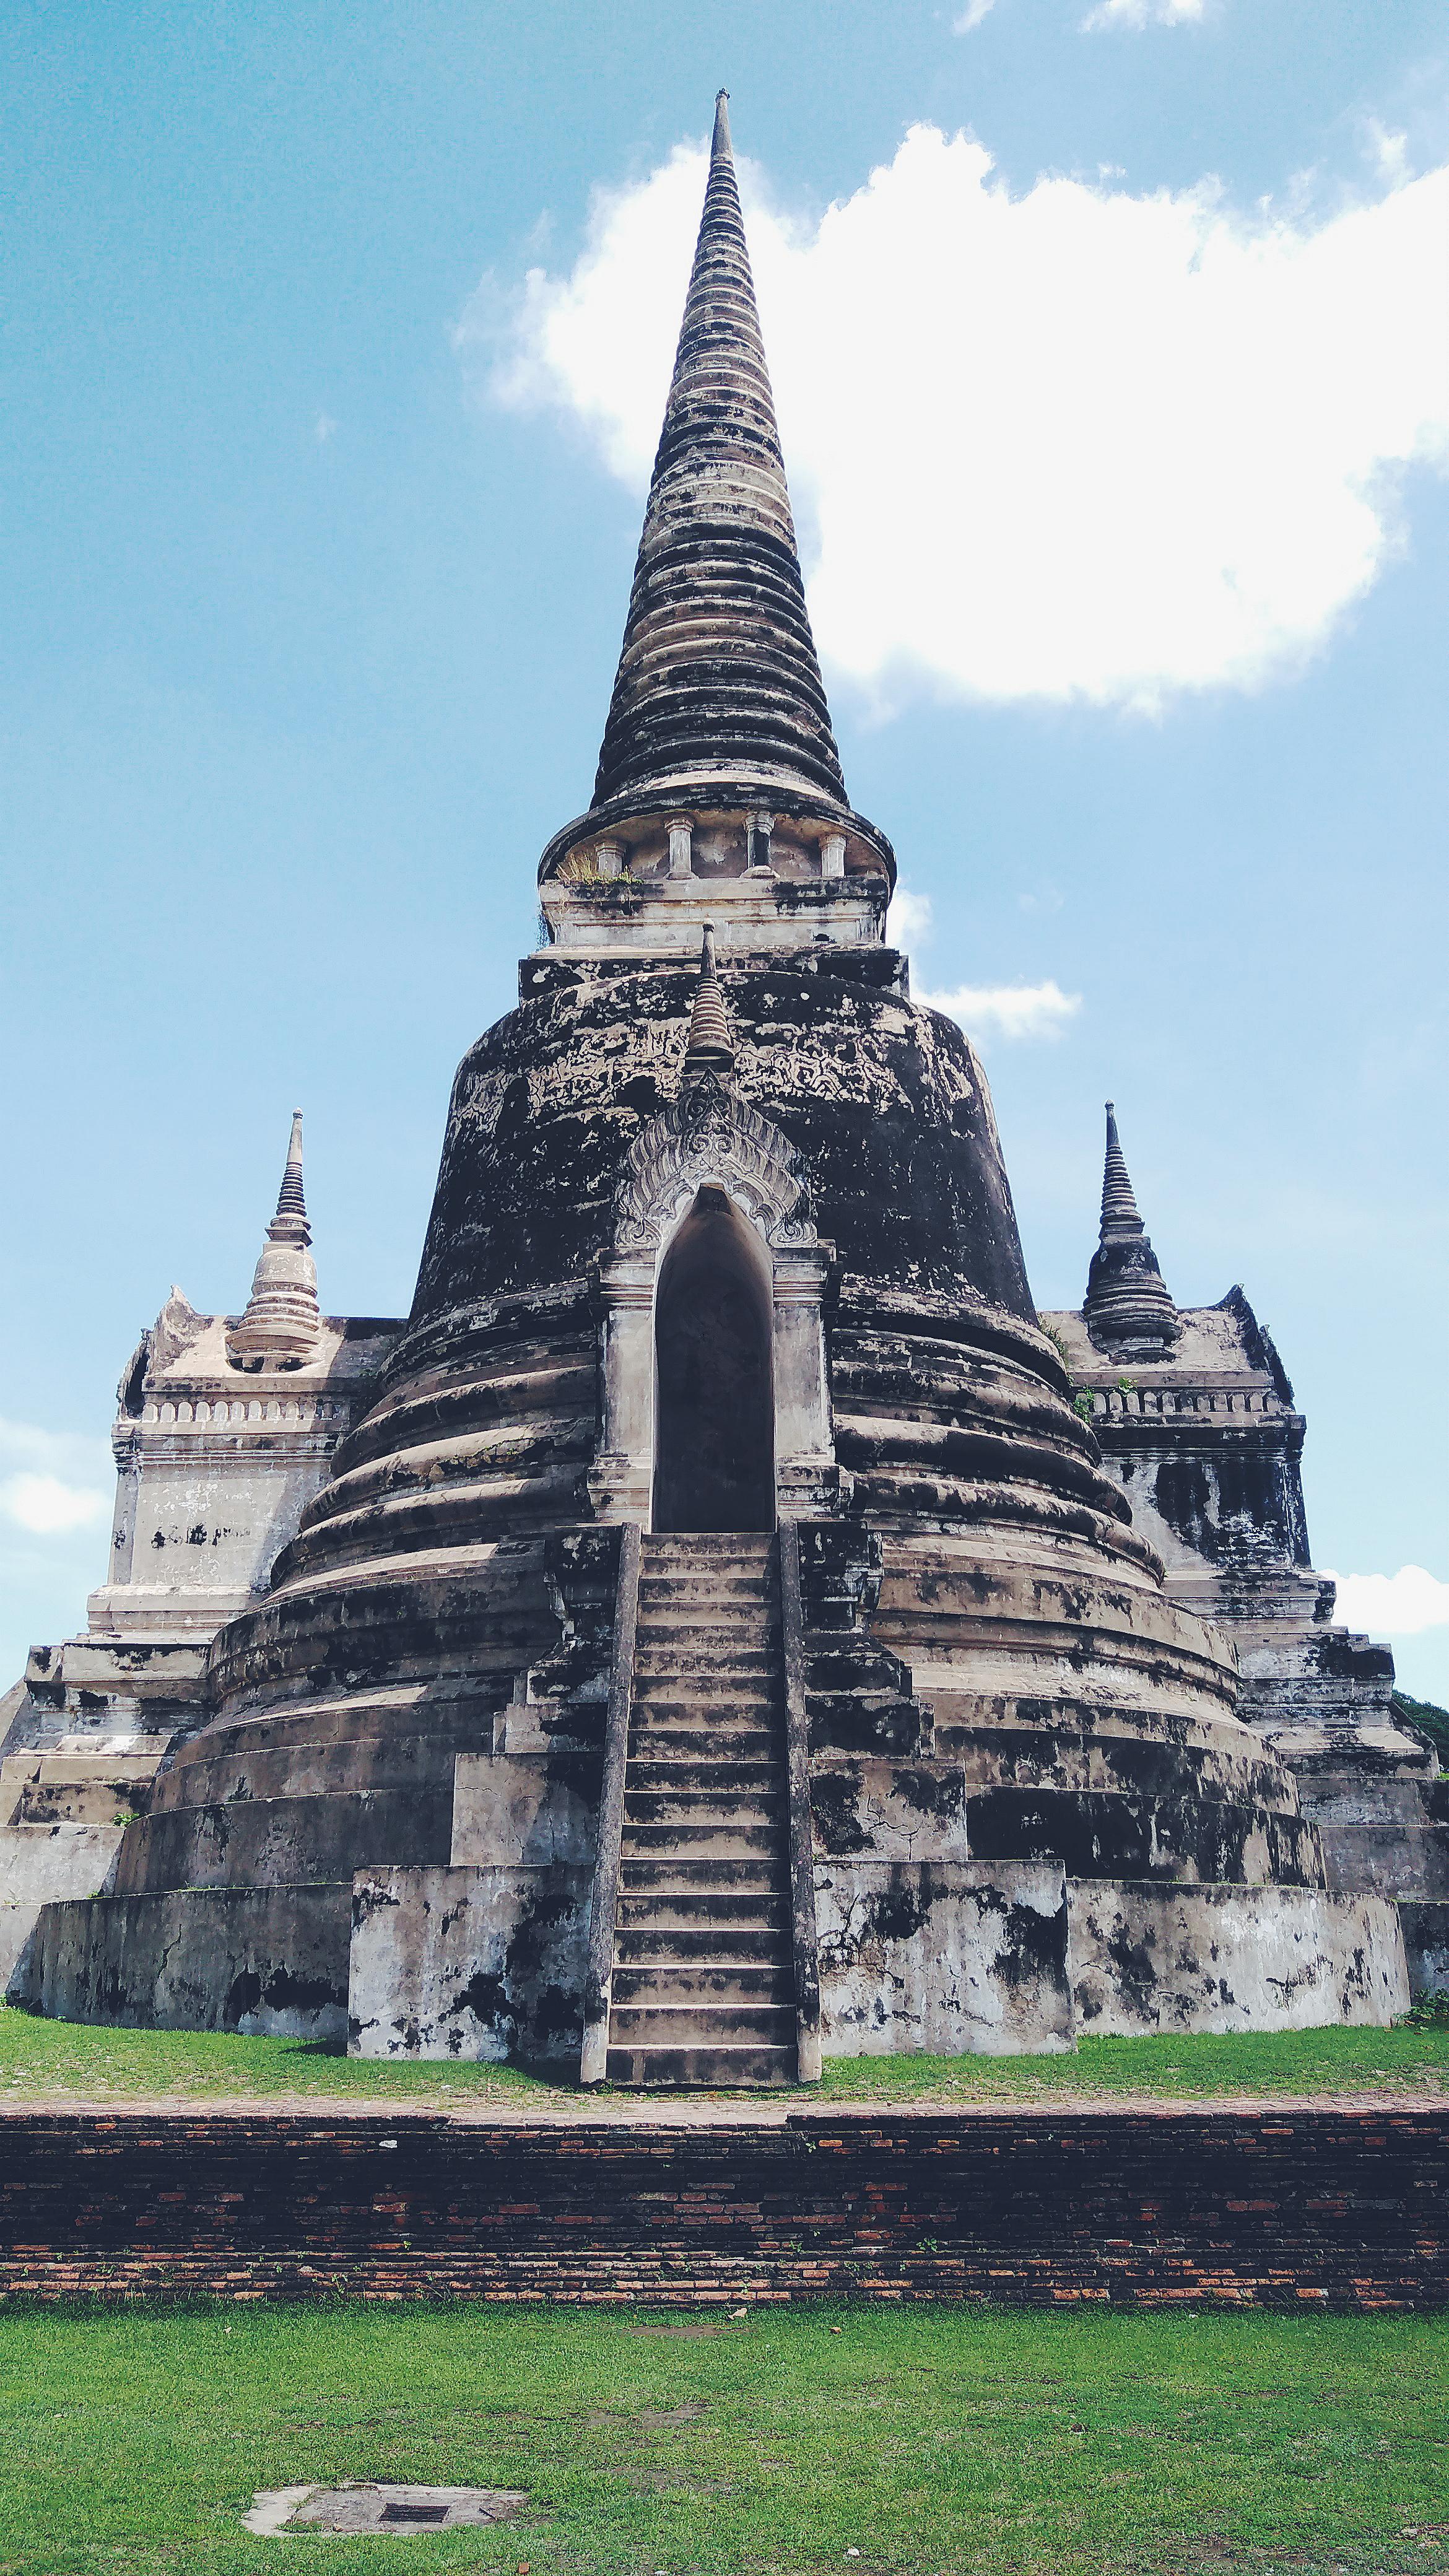 Temple Ruins of Ayutthaya, Thailand